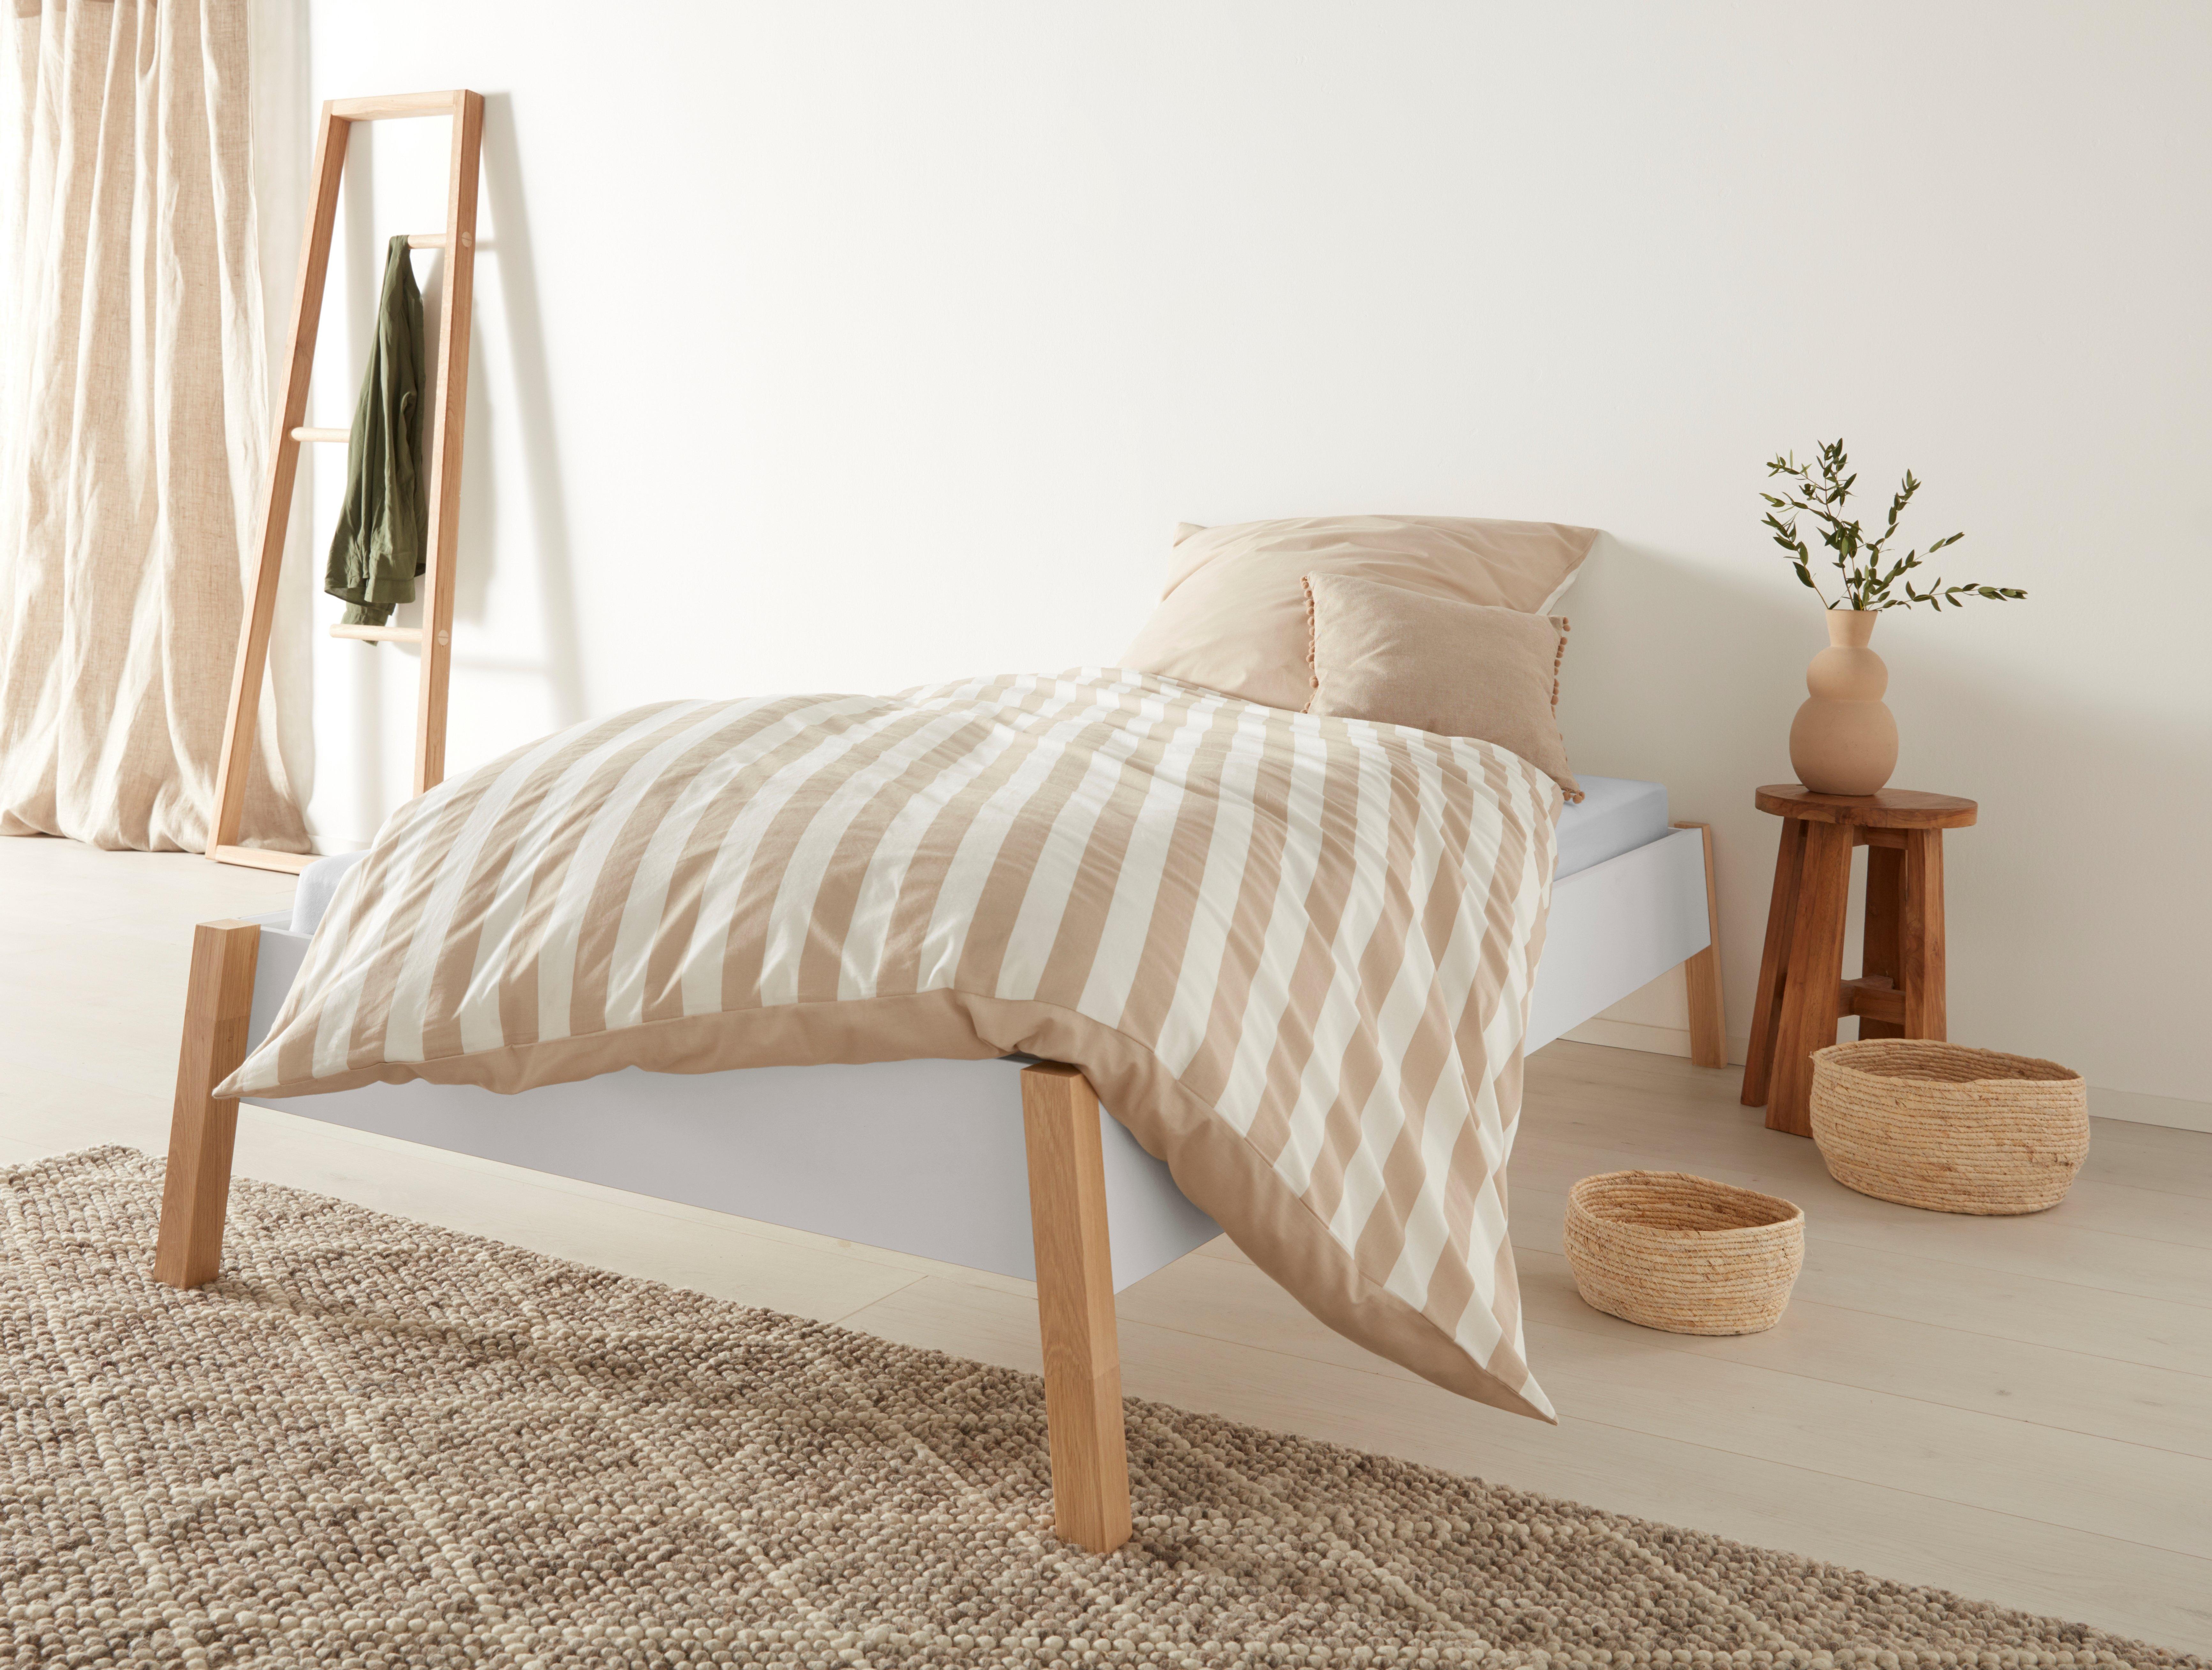 OTTO products bed Cobbo minimalistisch design, designed by michael hilgers - gratis ruilen op otto.nl